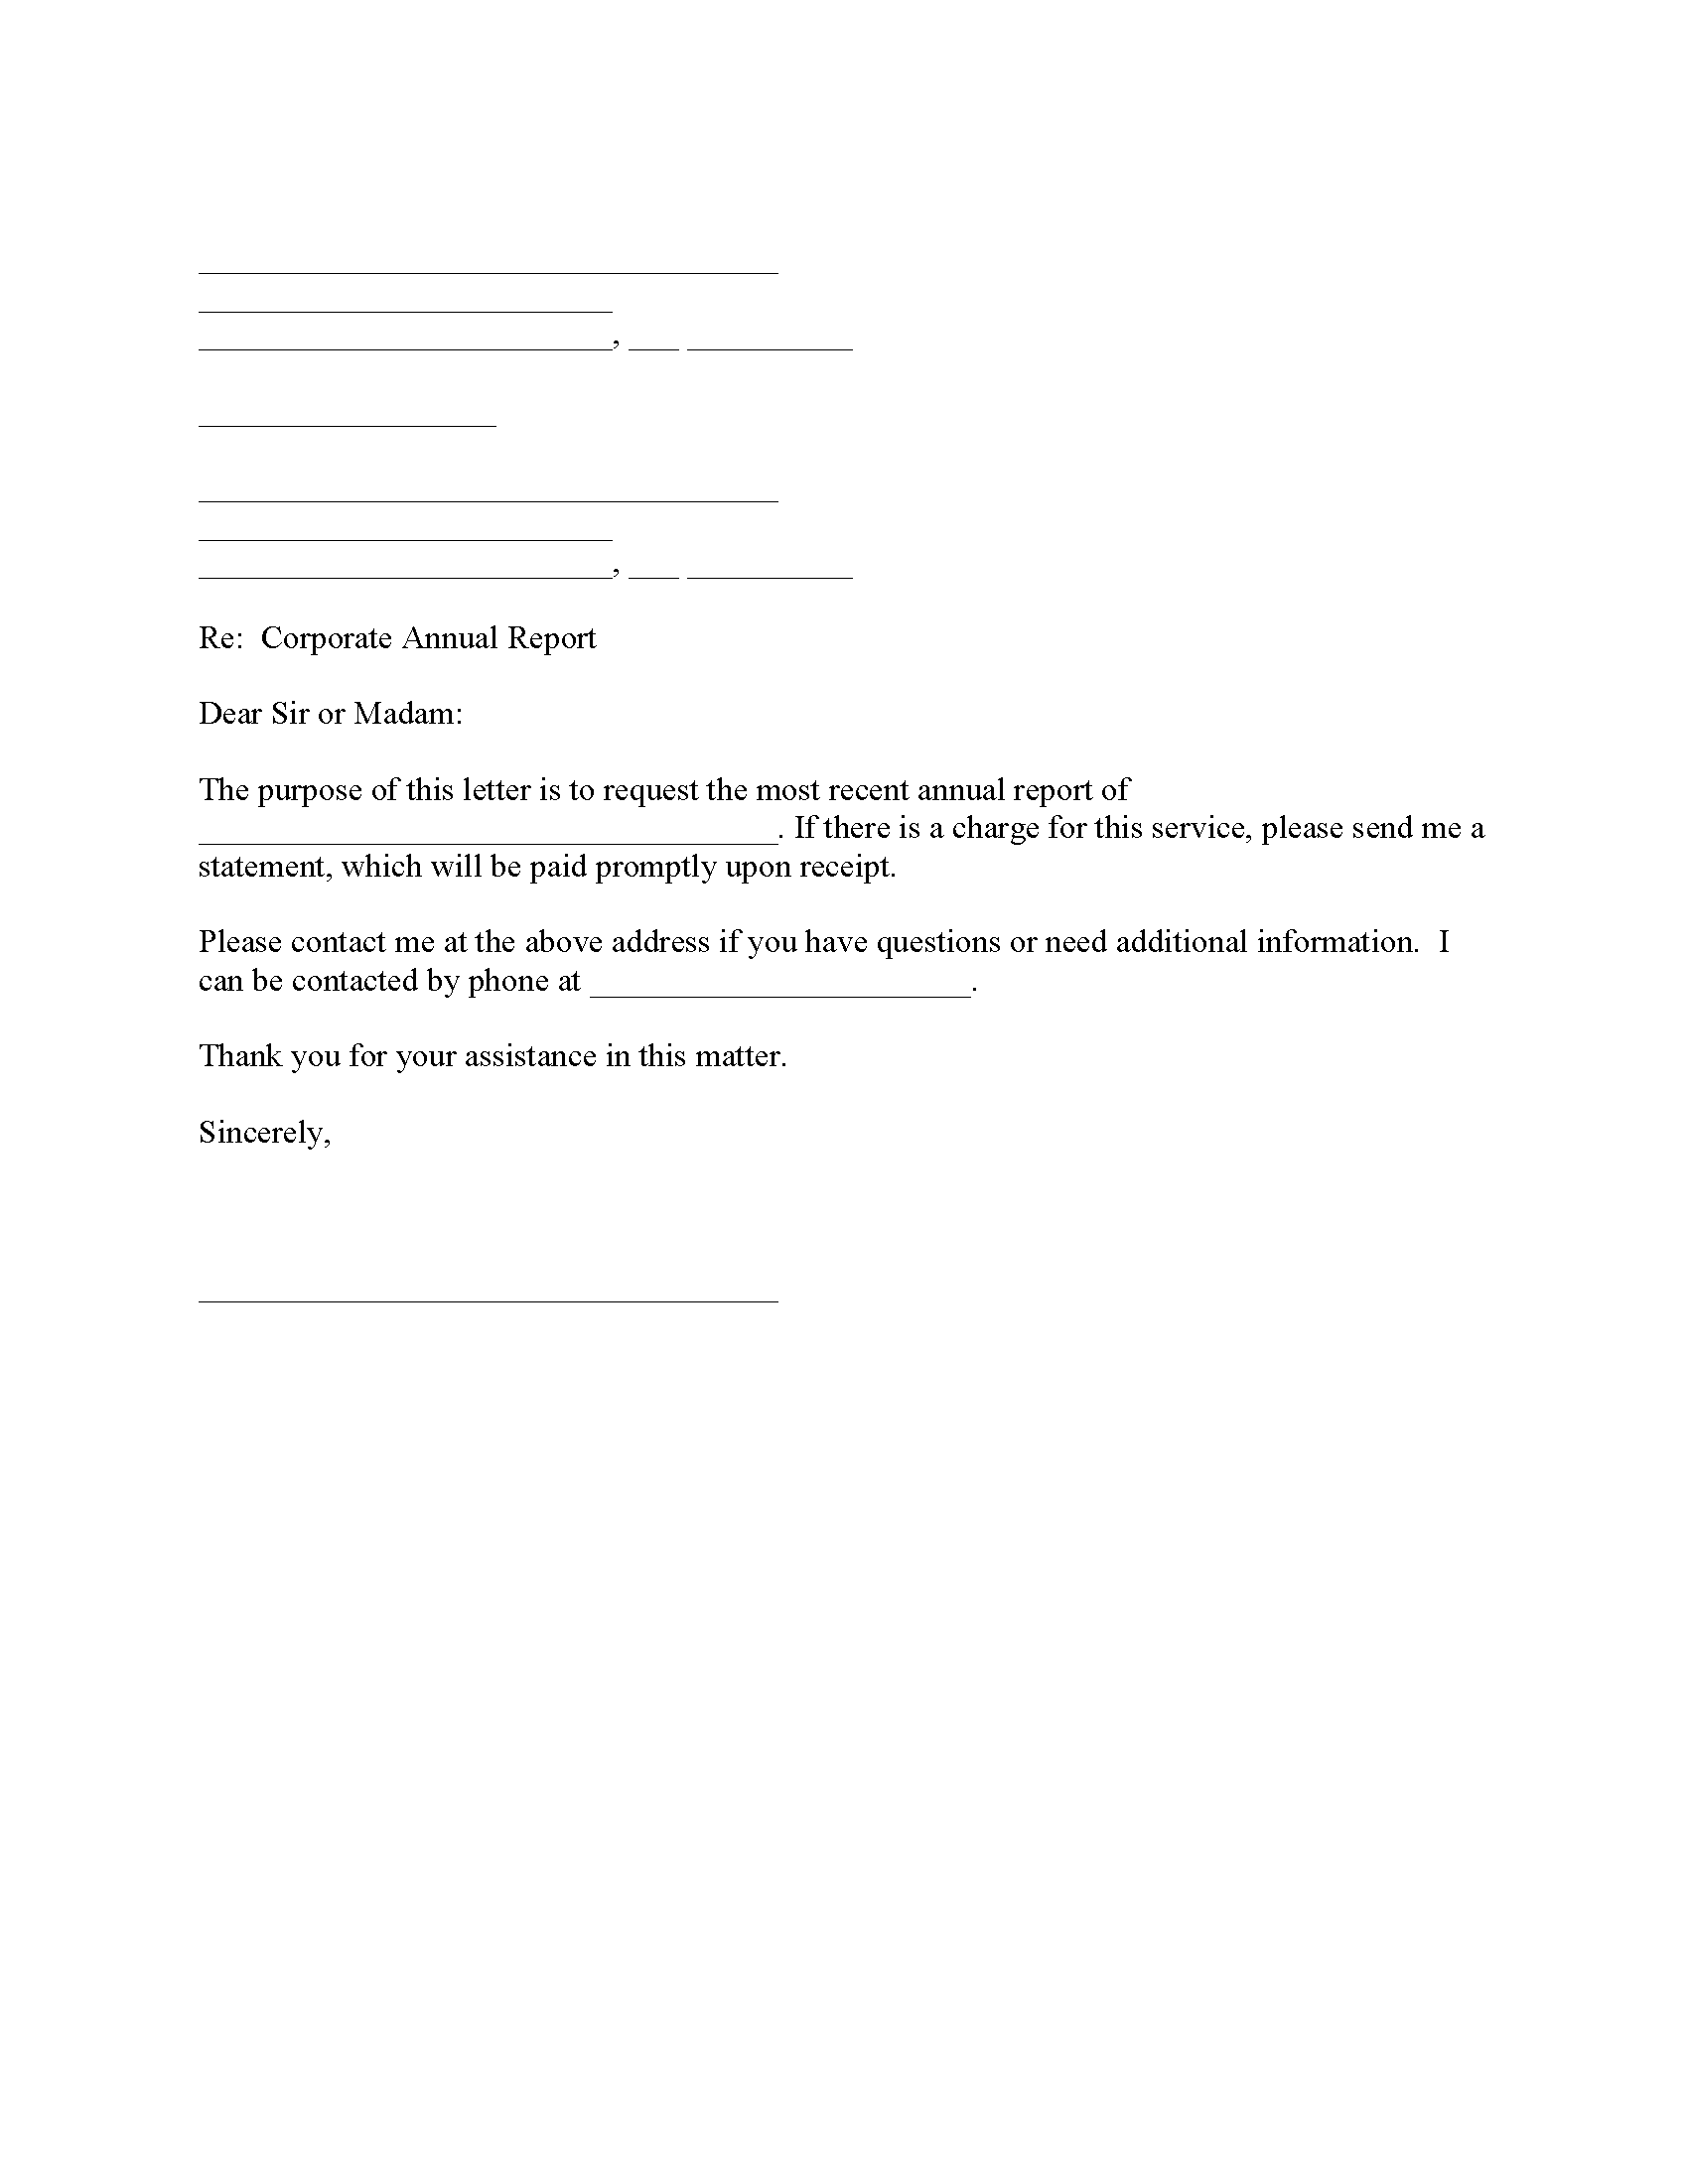 Annual Corporate Report Request